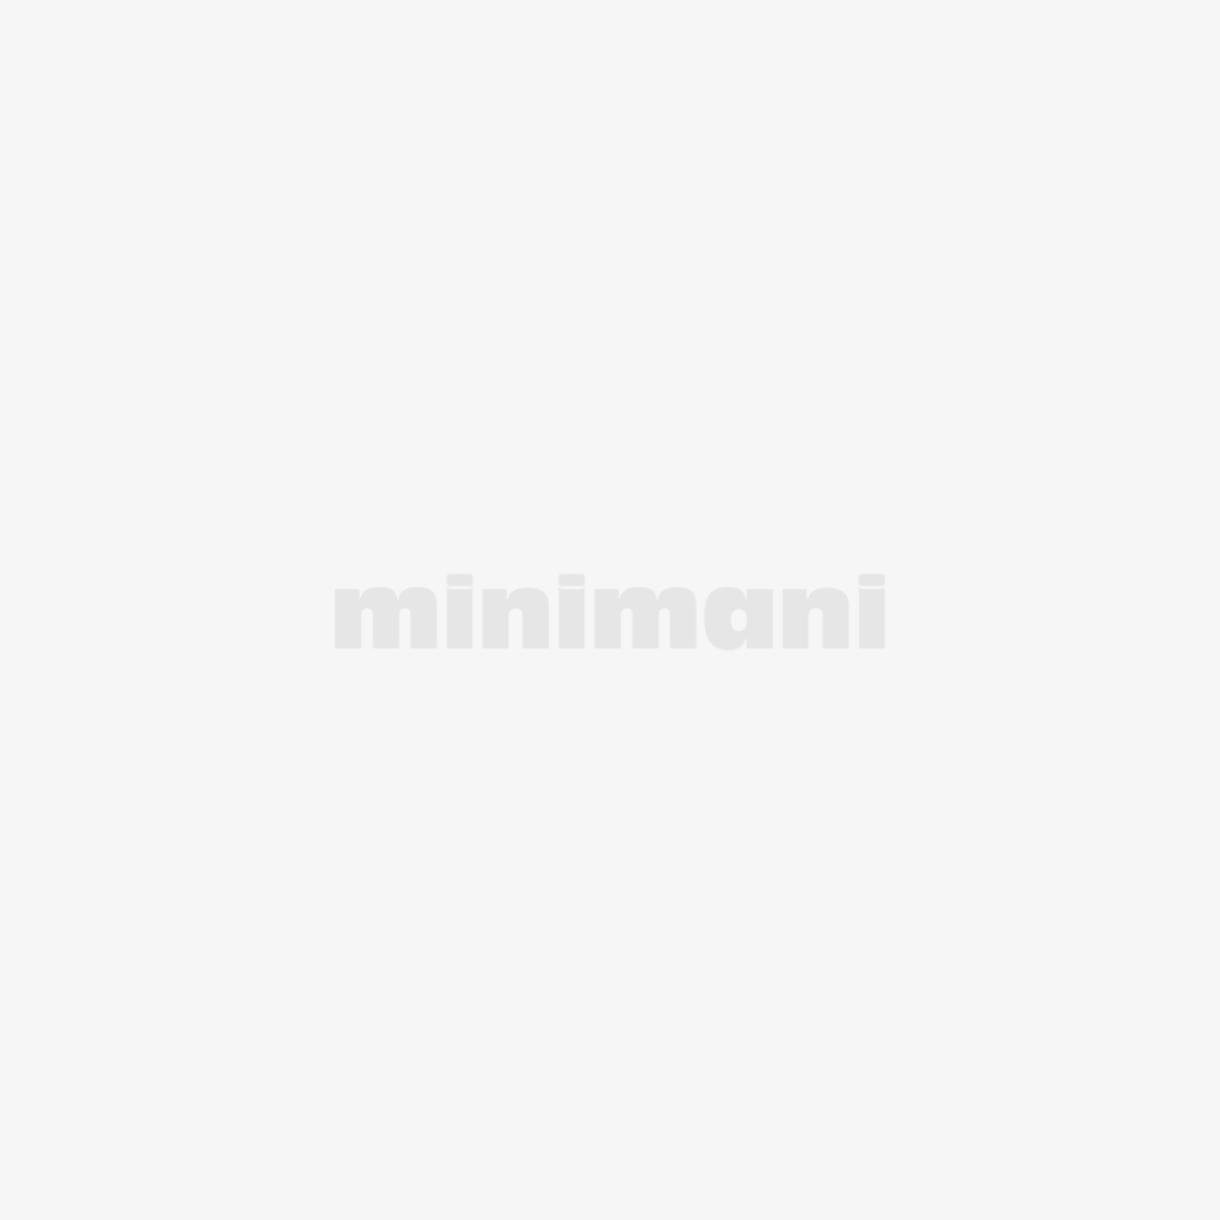 TALOUSMITTA DOMINO 0,5 L